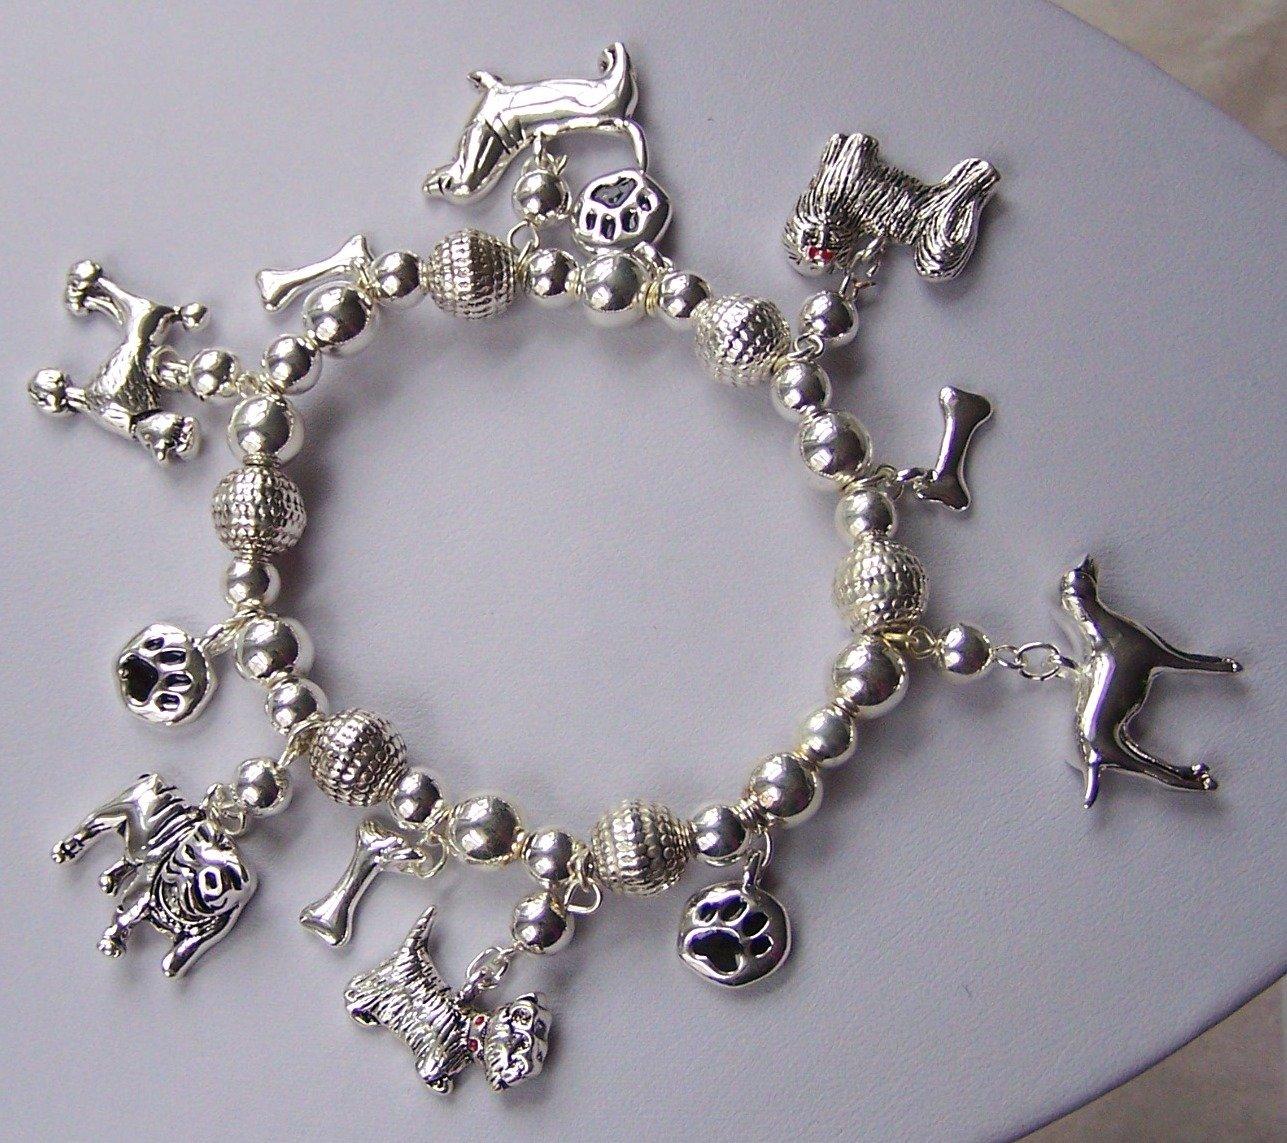 Puppy Dog Paws Animal Charm Bracelet